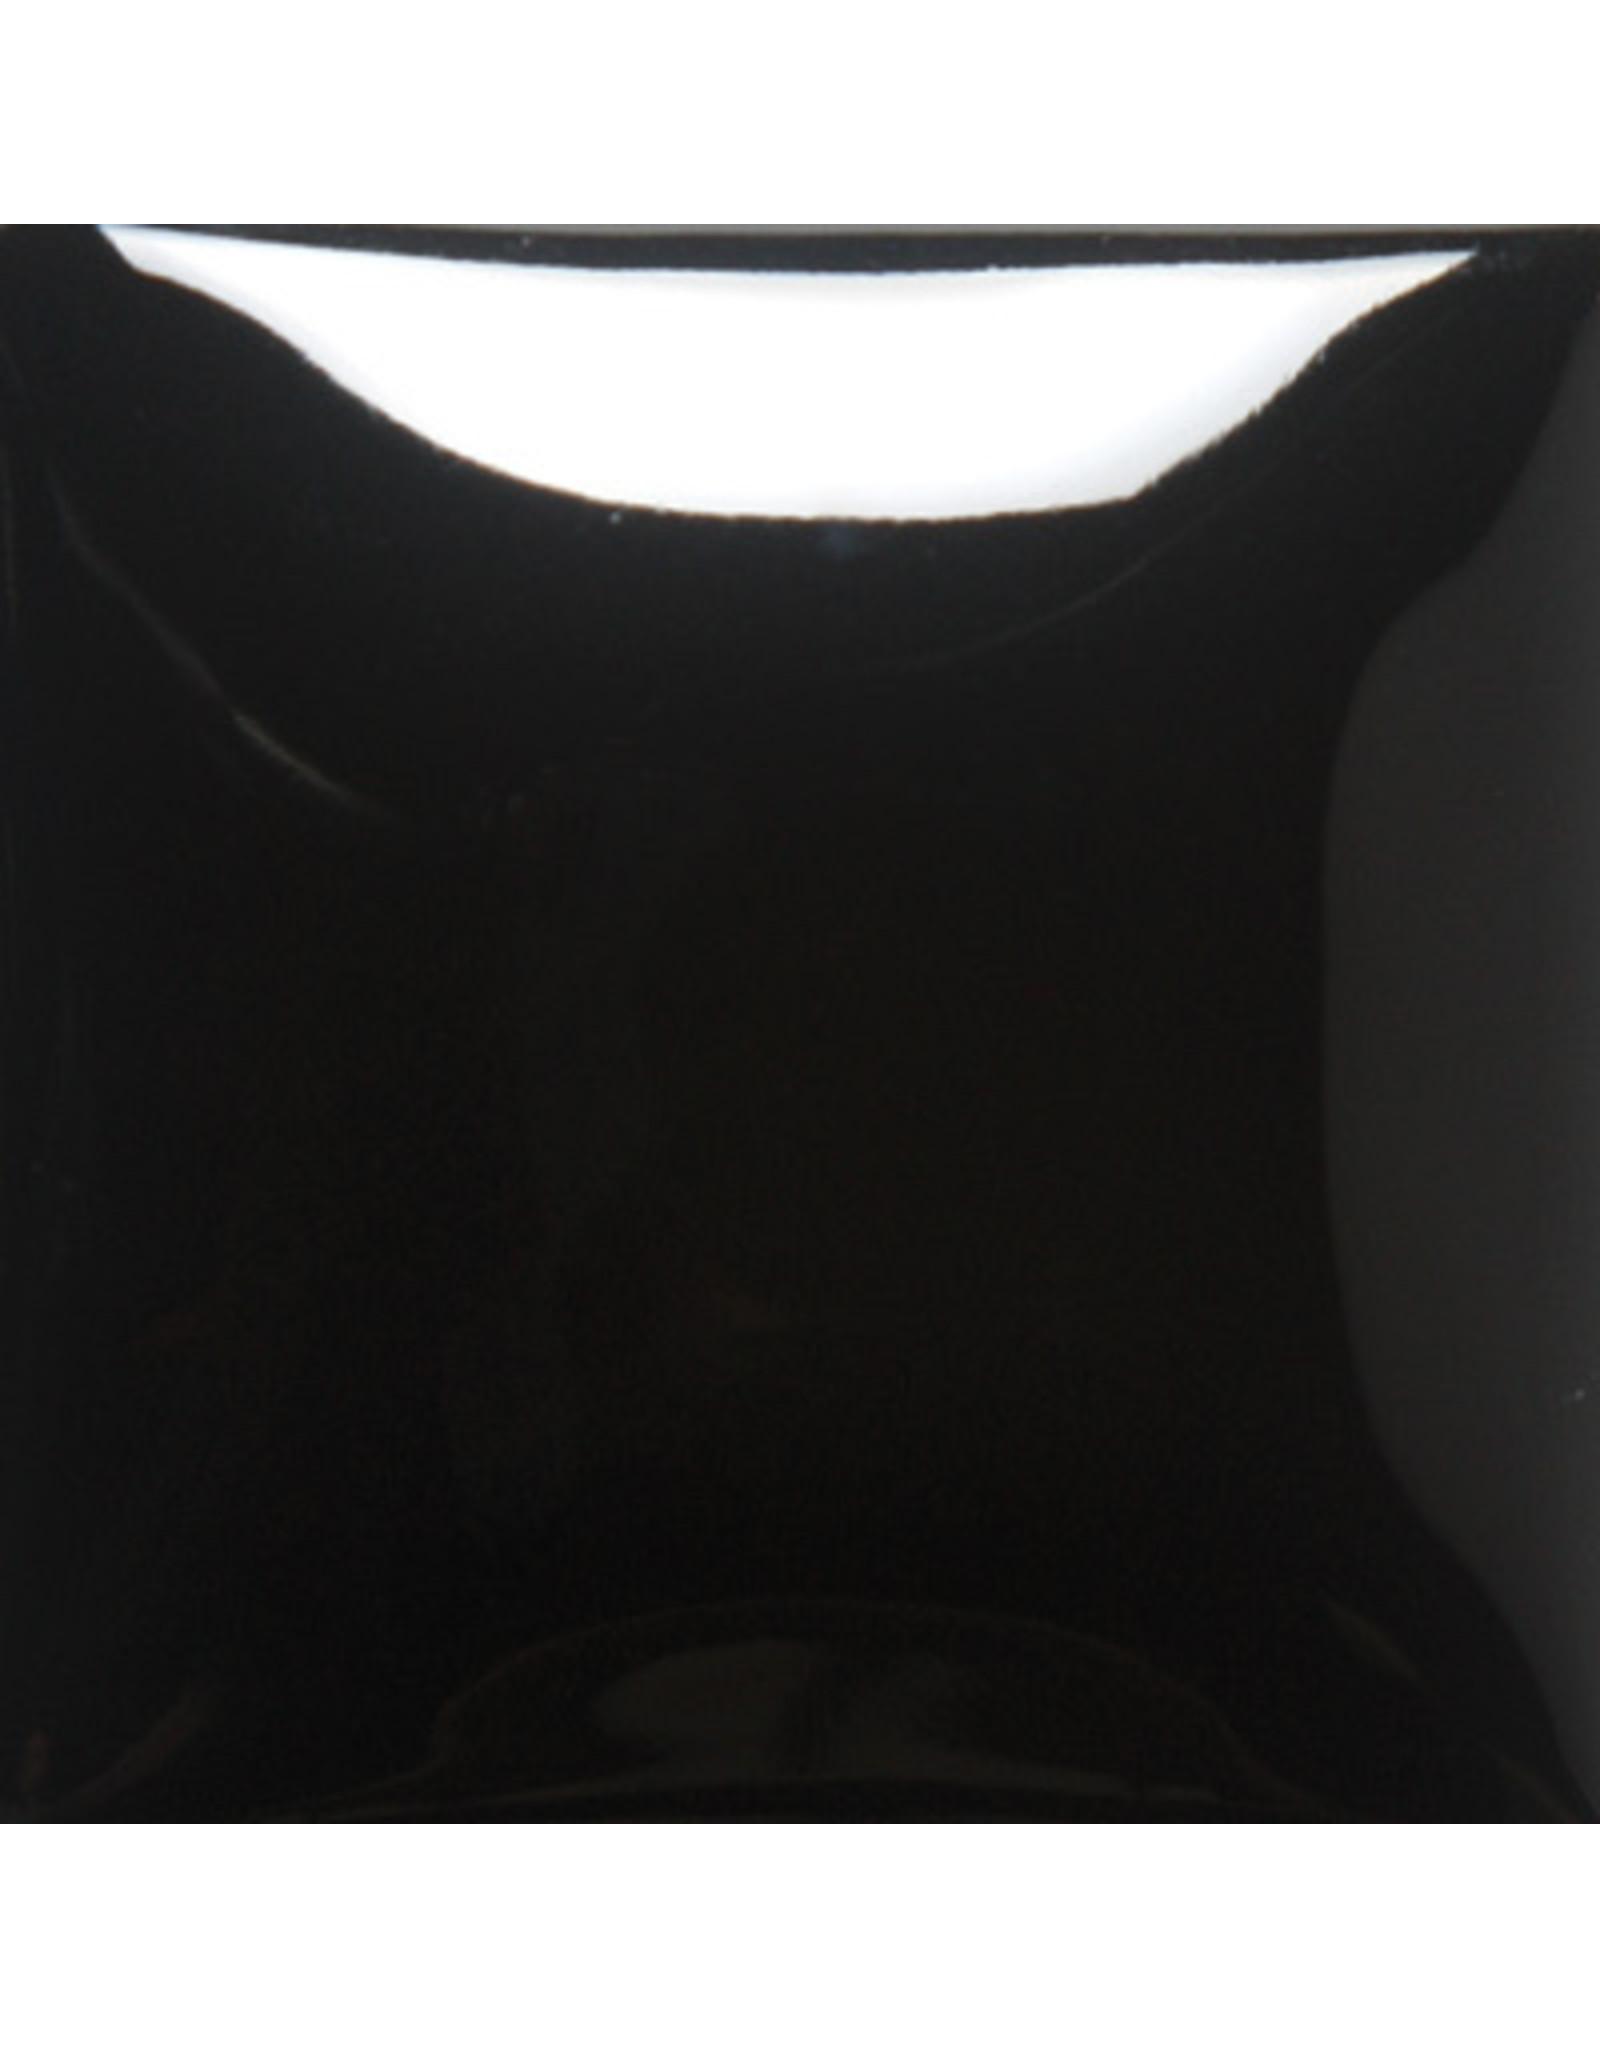 Mayco Mayco Foundations Black - 118ml